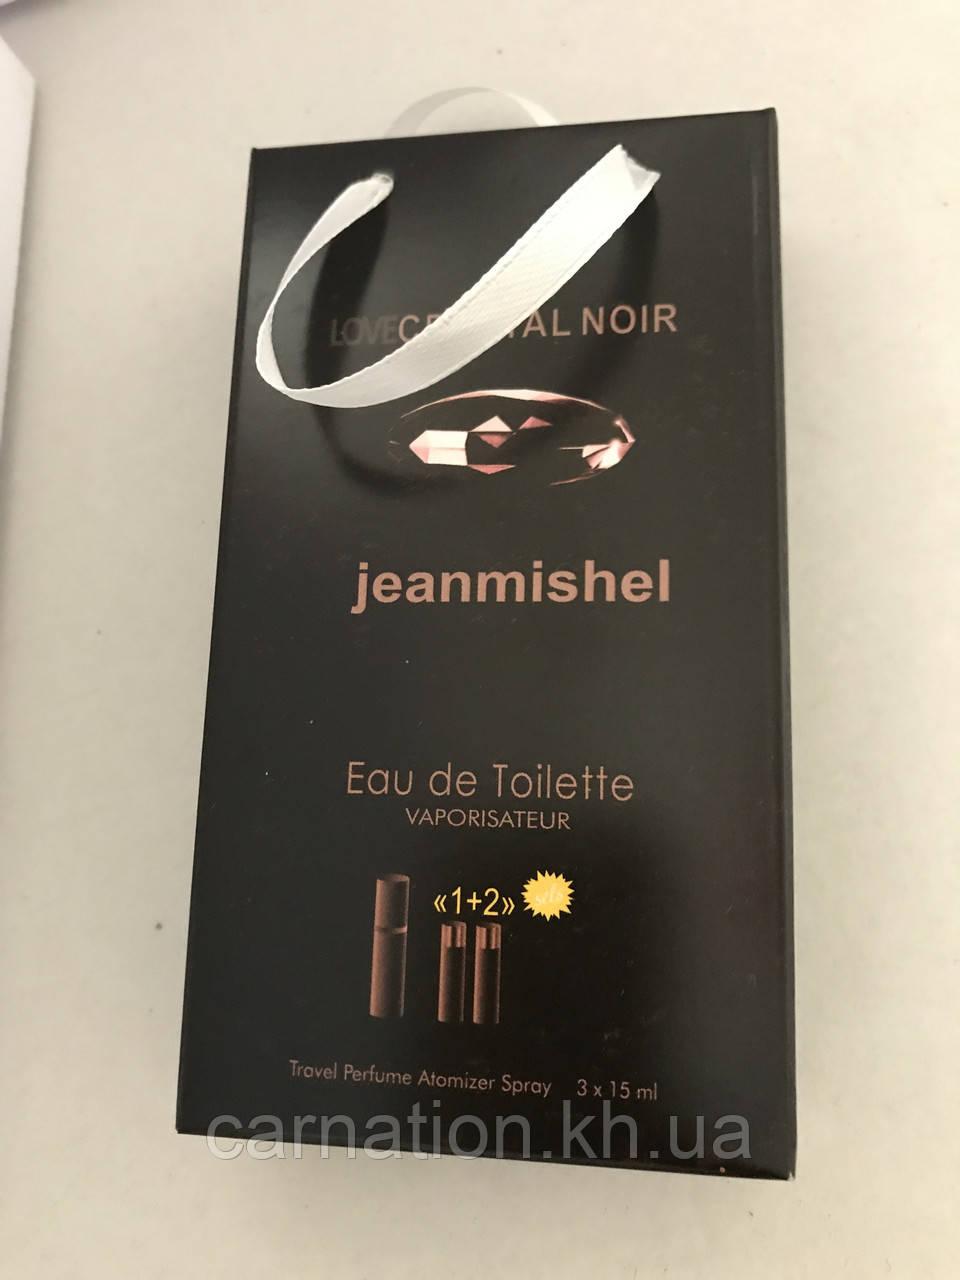 Подарочный набор LoveCrystal Noir Jeanmishel 3*15 мл